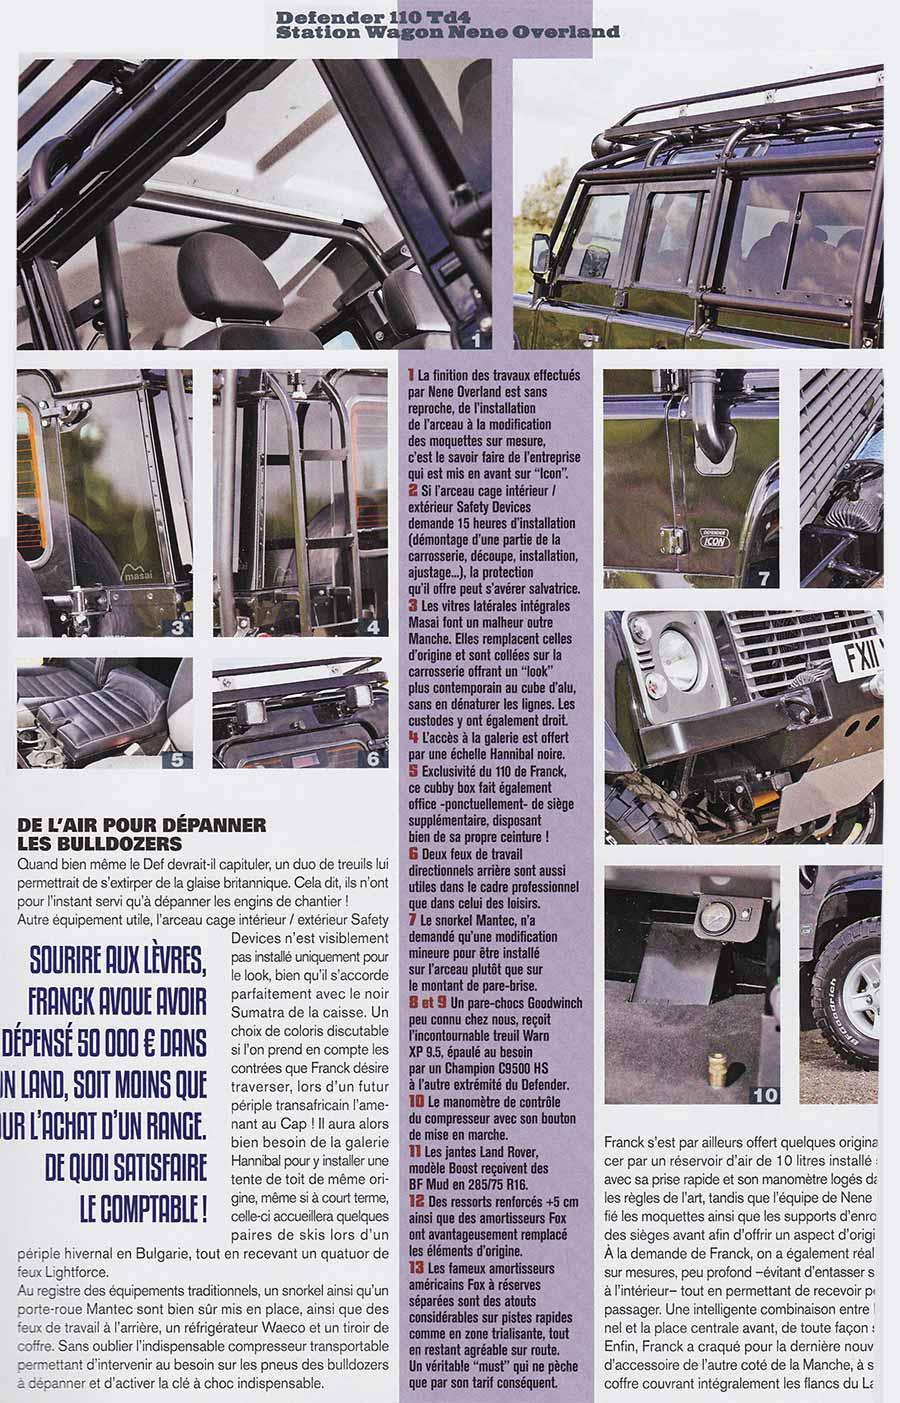 French Magazine Article